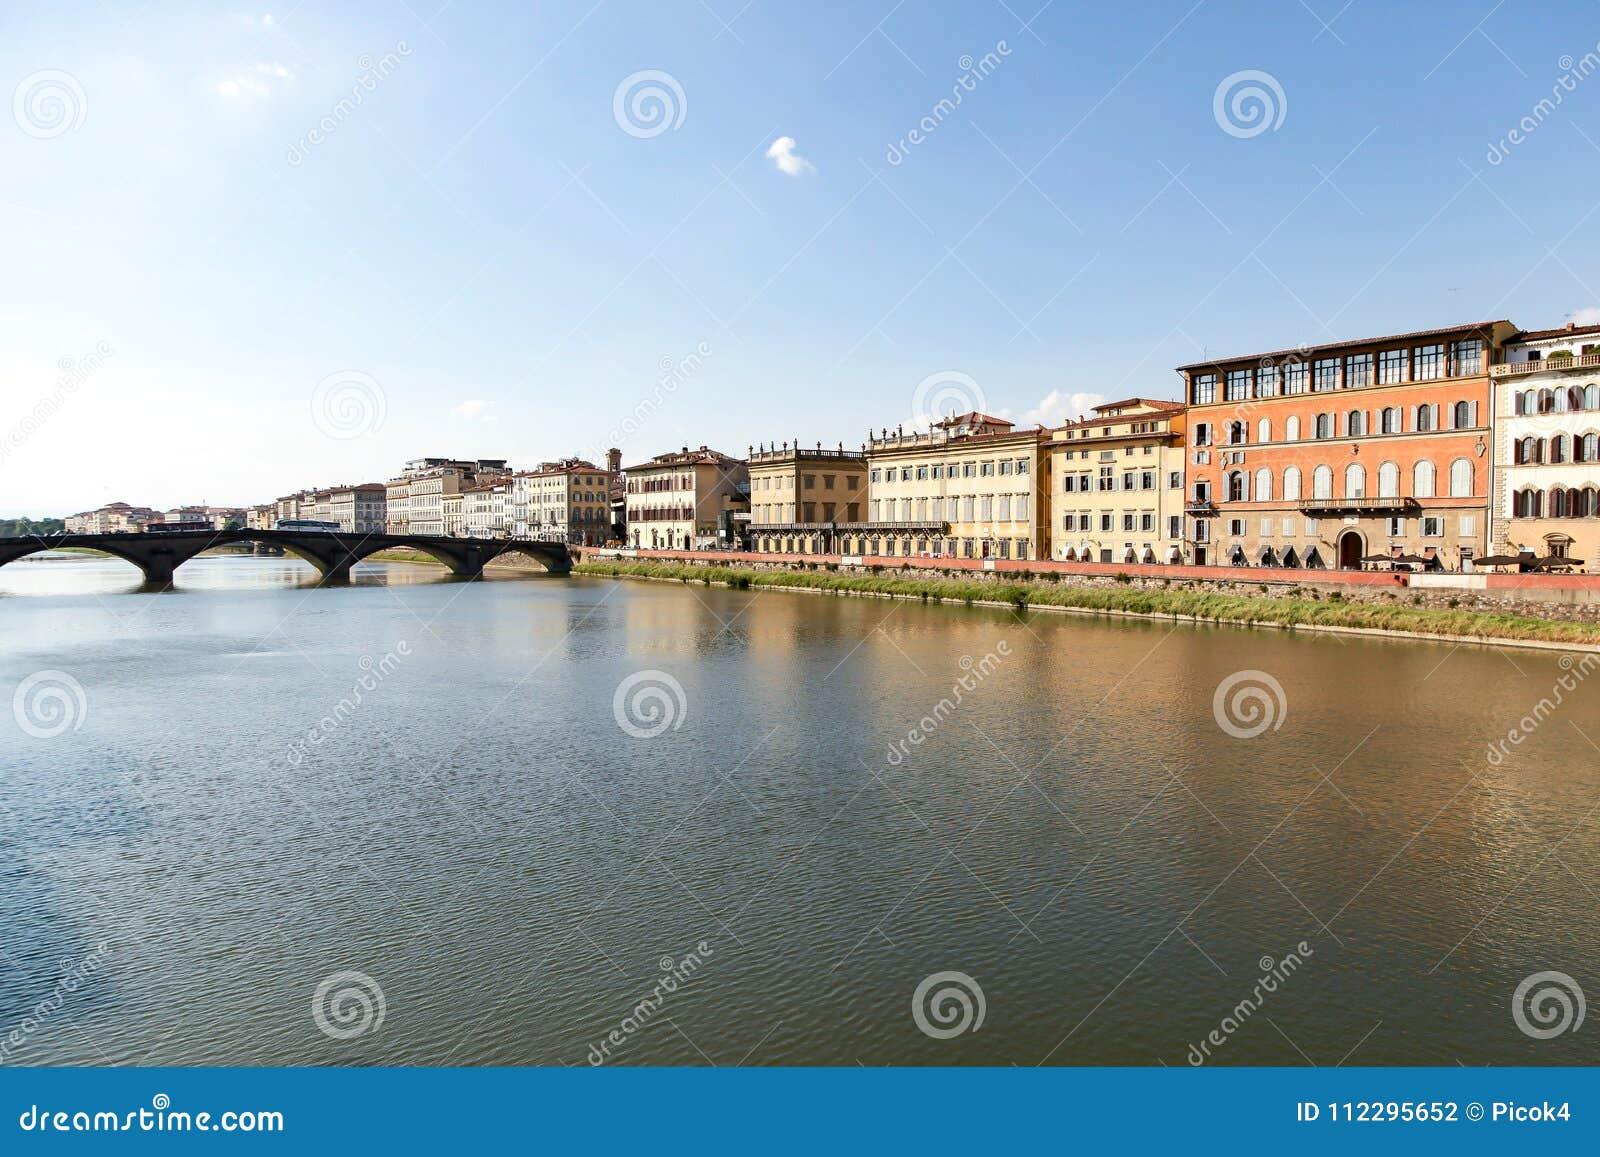 Brücke über Arno River in Florenz, Italien